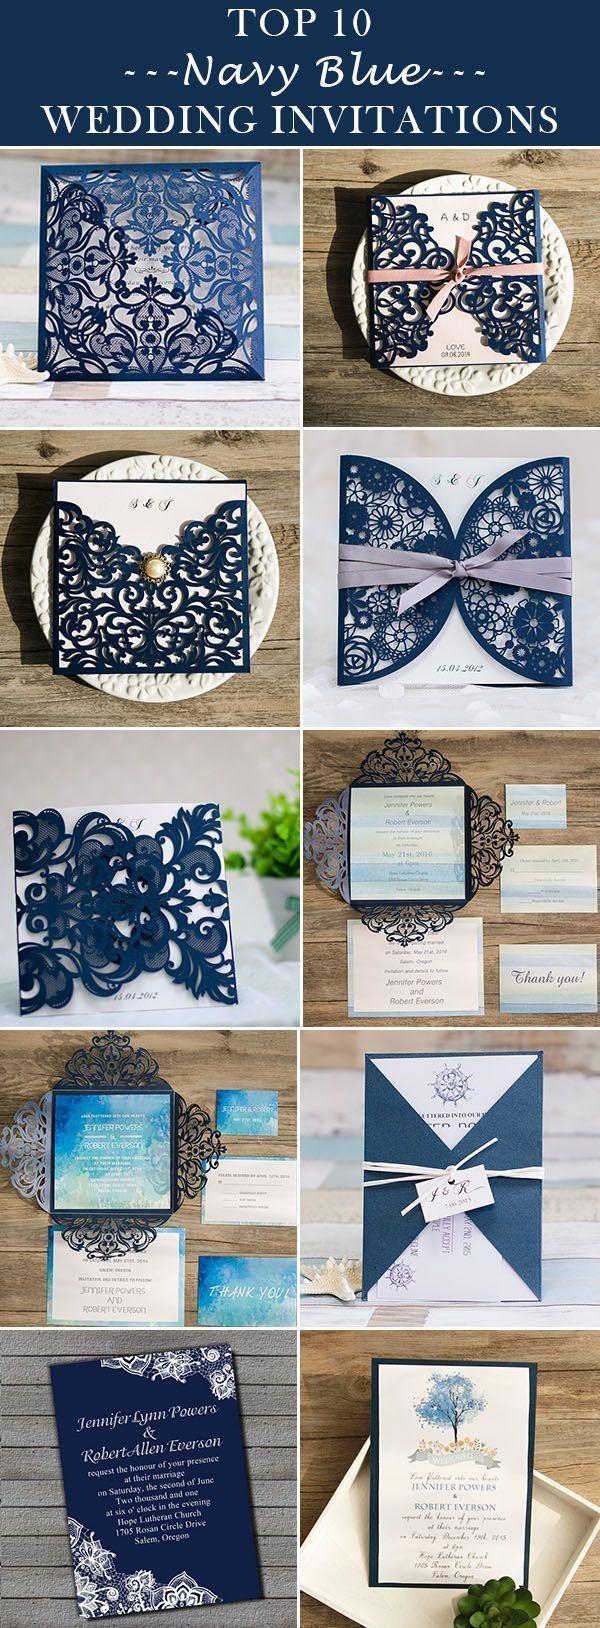 Top 10 trending navy blue wedding invitations for 2016 brides rsvp classic navy blue wedding invitations 2016 trends elegantweddinginvites free rsvp cards free shipping stopboris Image collections